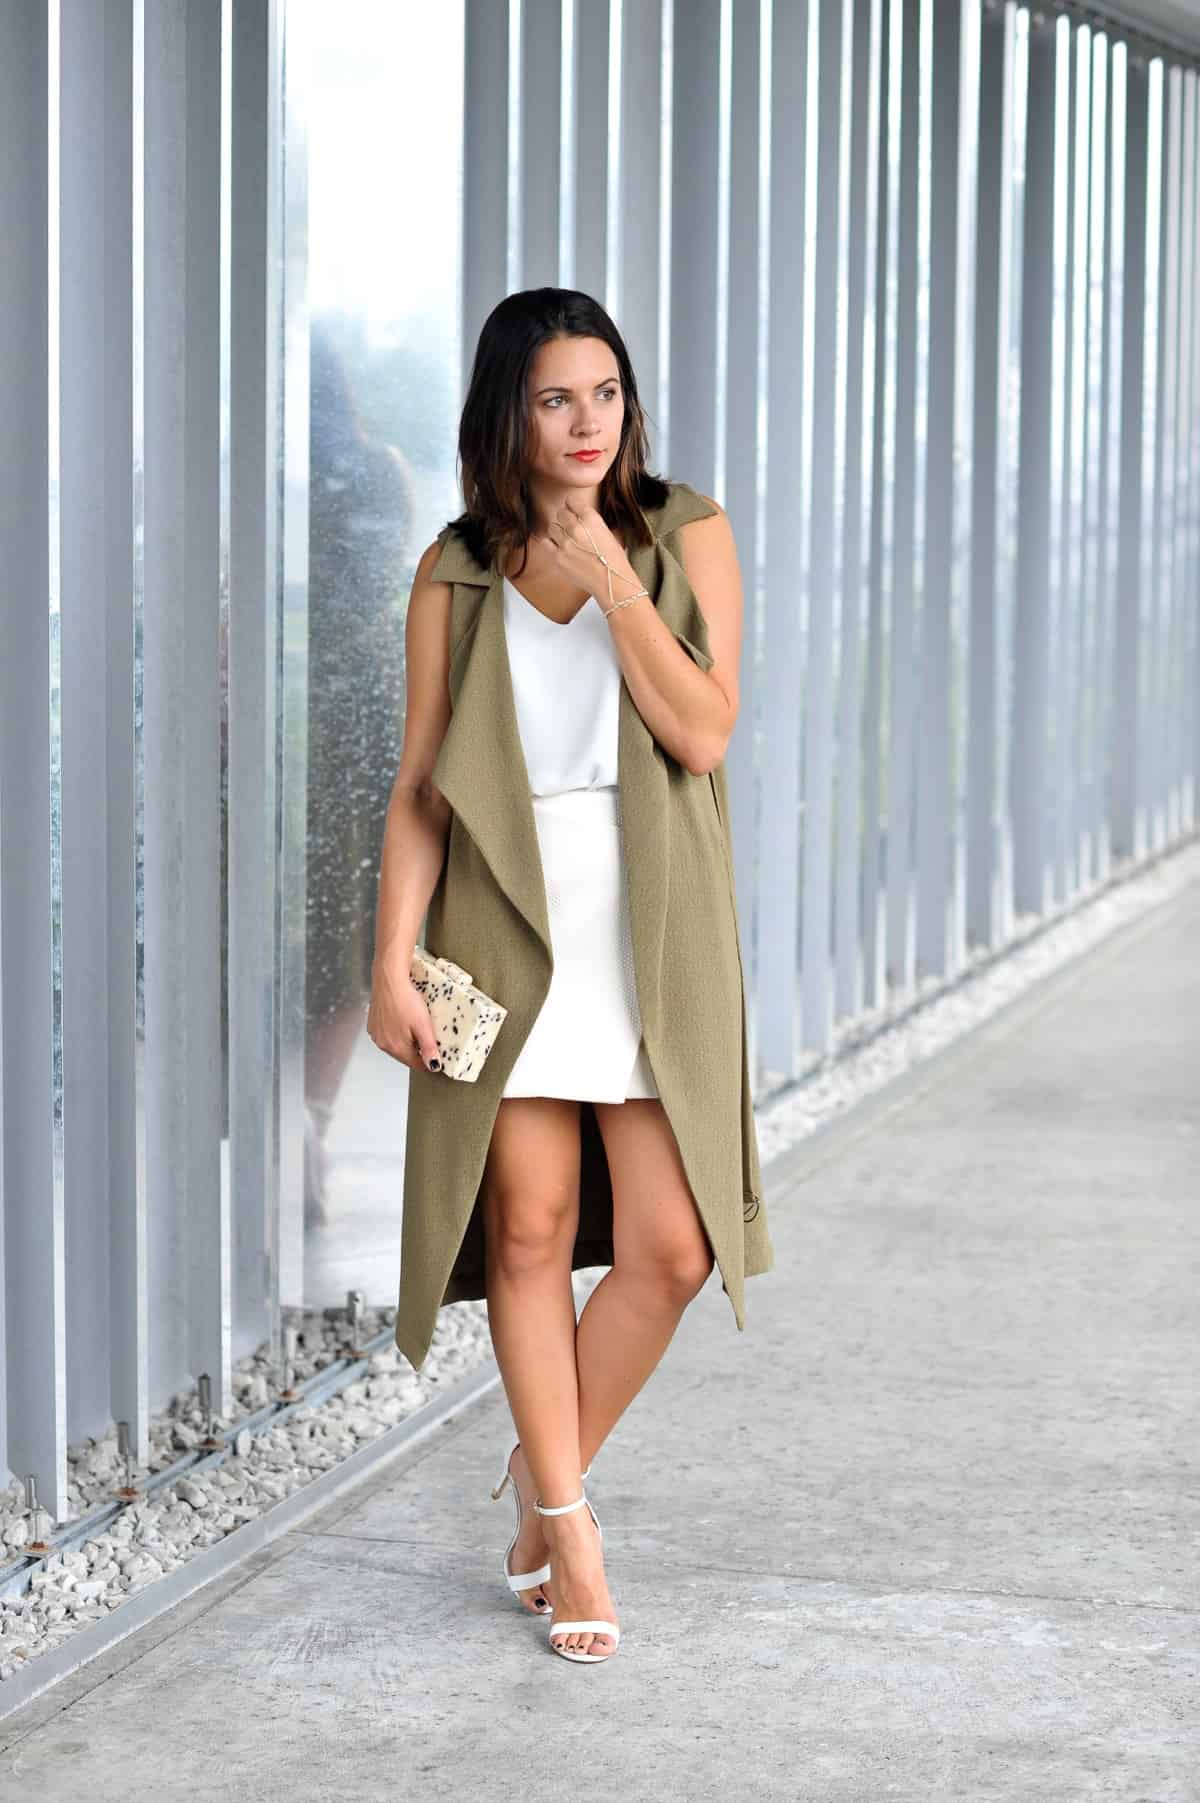 how to style a duster, Jessica Camerata, My Style Vita, Atlanta fashion blogger